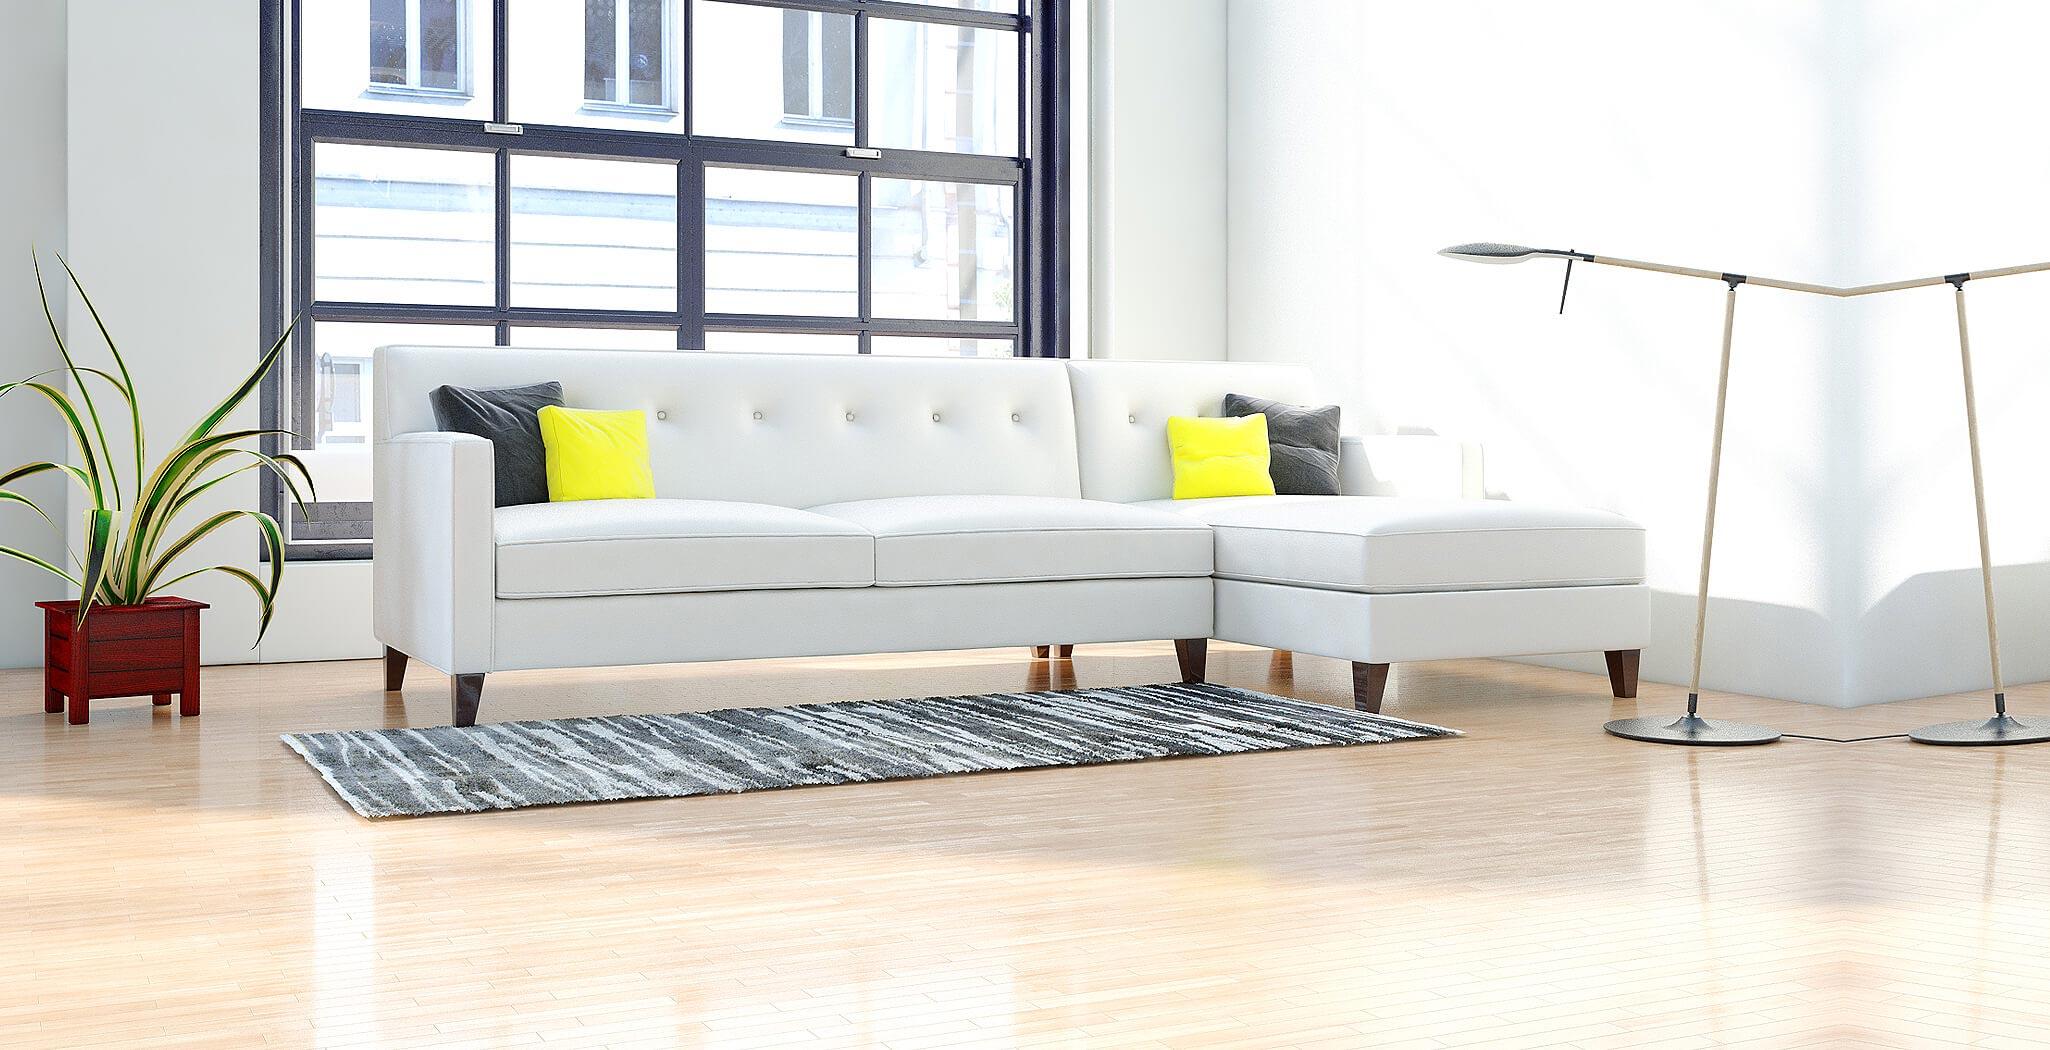 harper panel furniture gallery 2